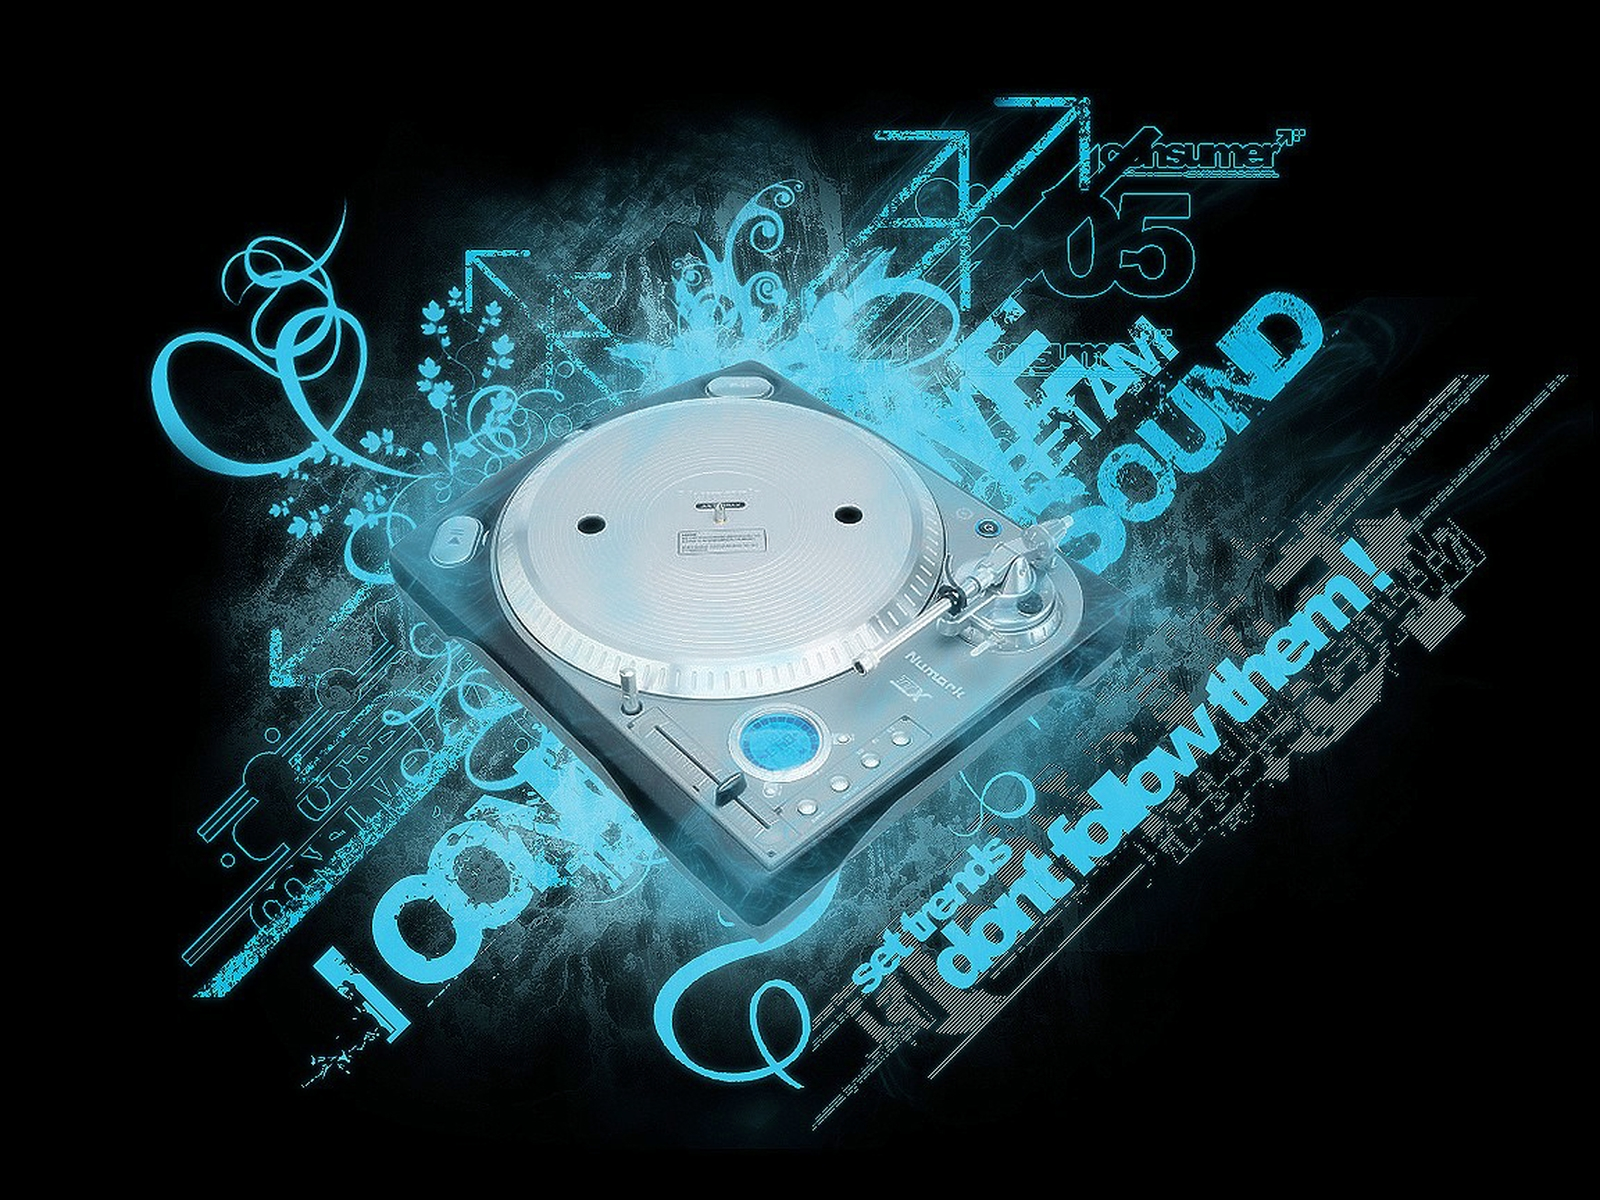 1600x1200 Disk Jockey sound desktop PC and Mac wallpaper 1600x1200